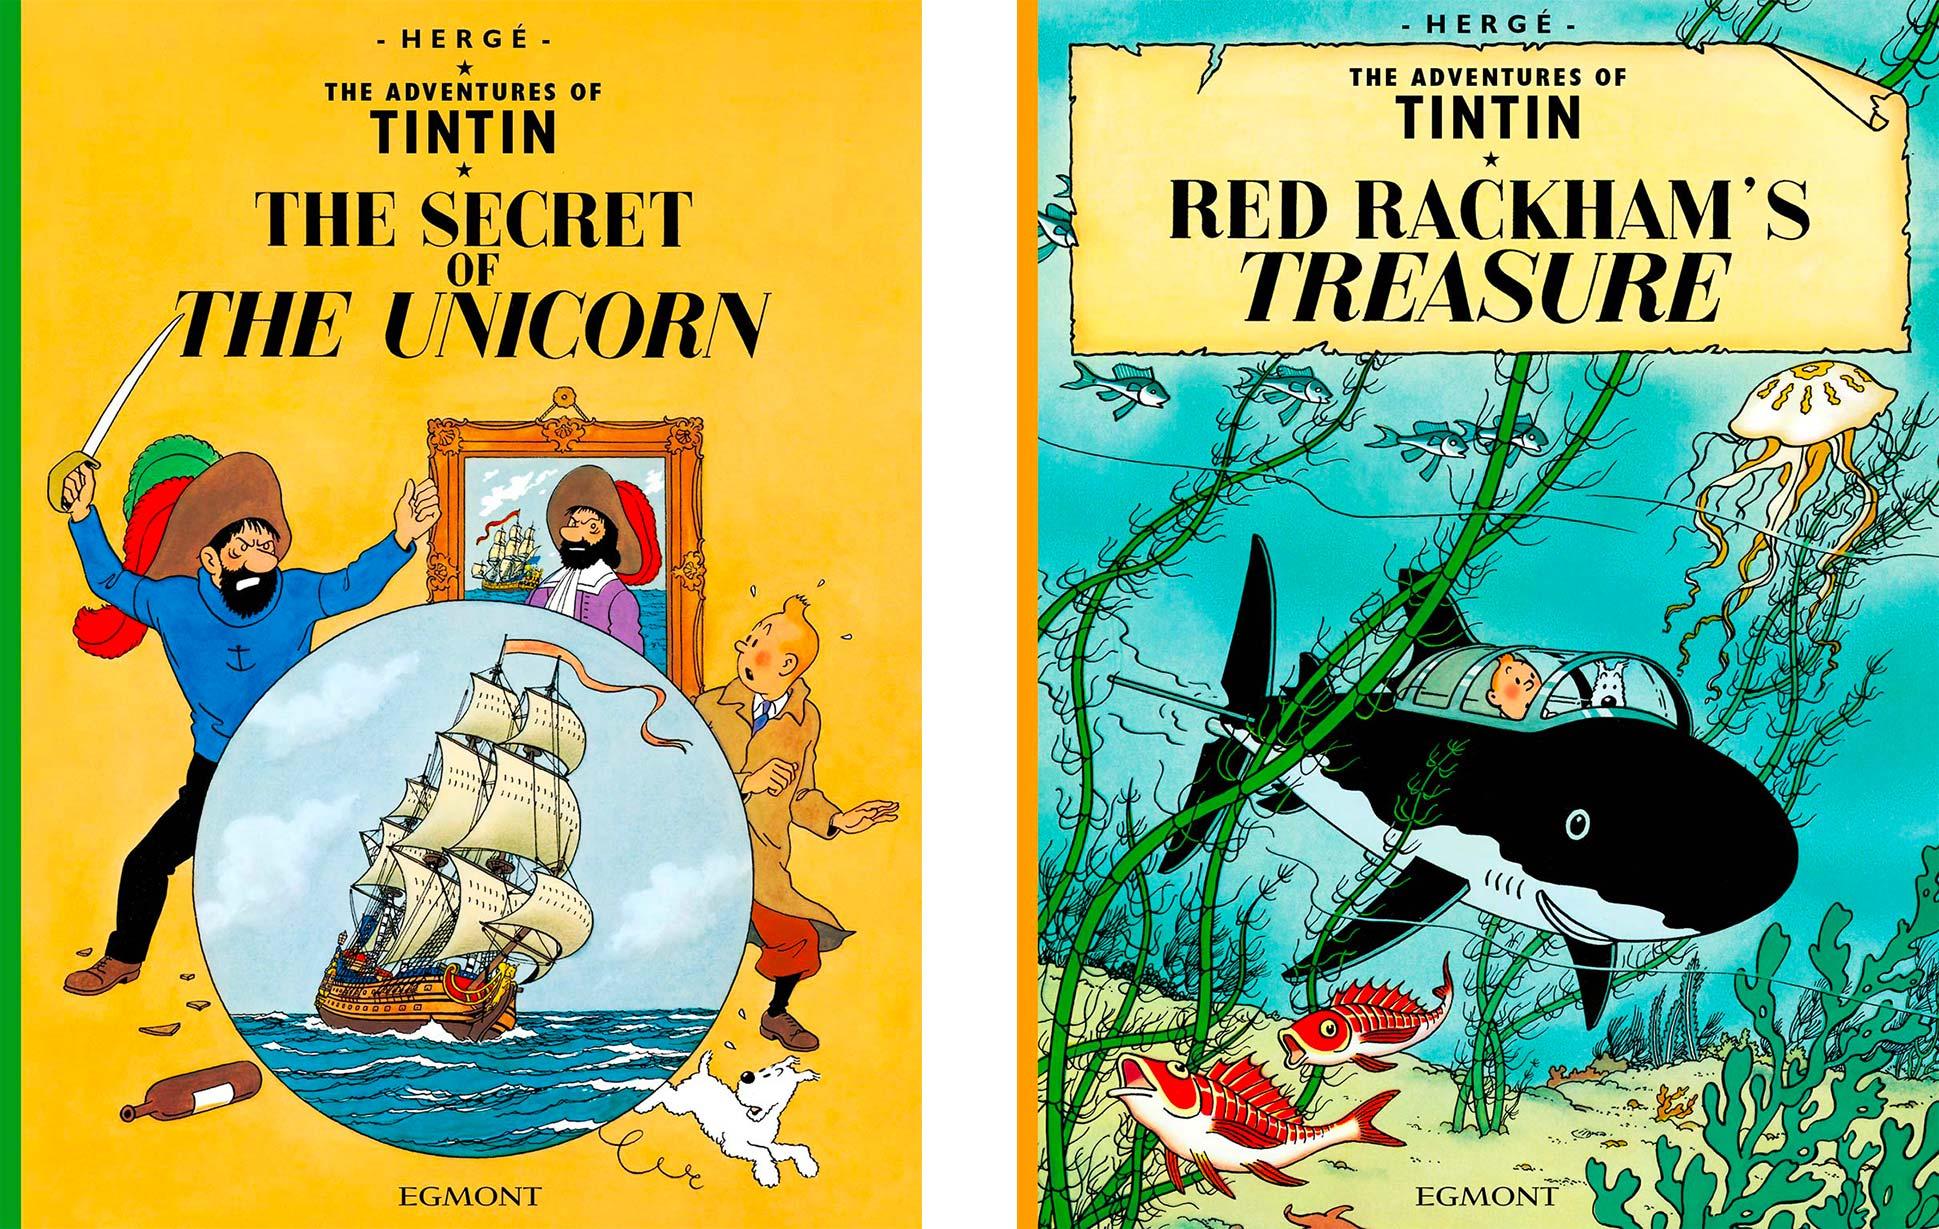 The Secret of the Unicorn - Red Rackham's Treasure